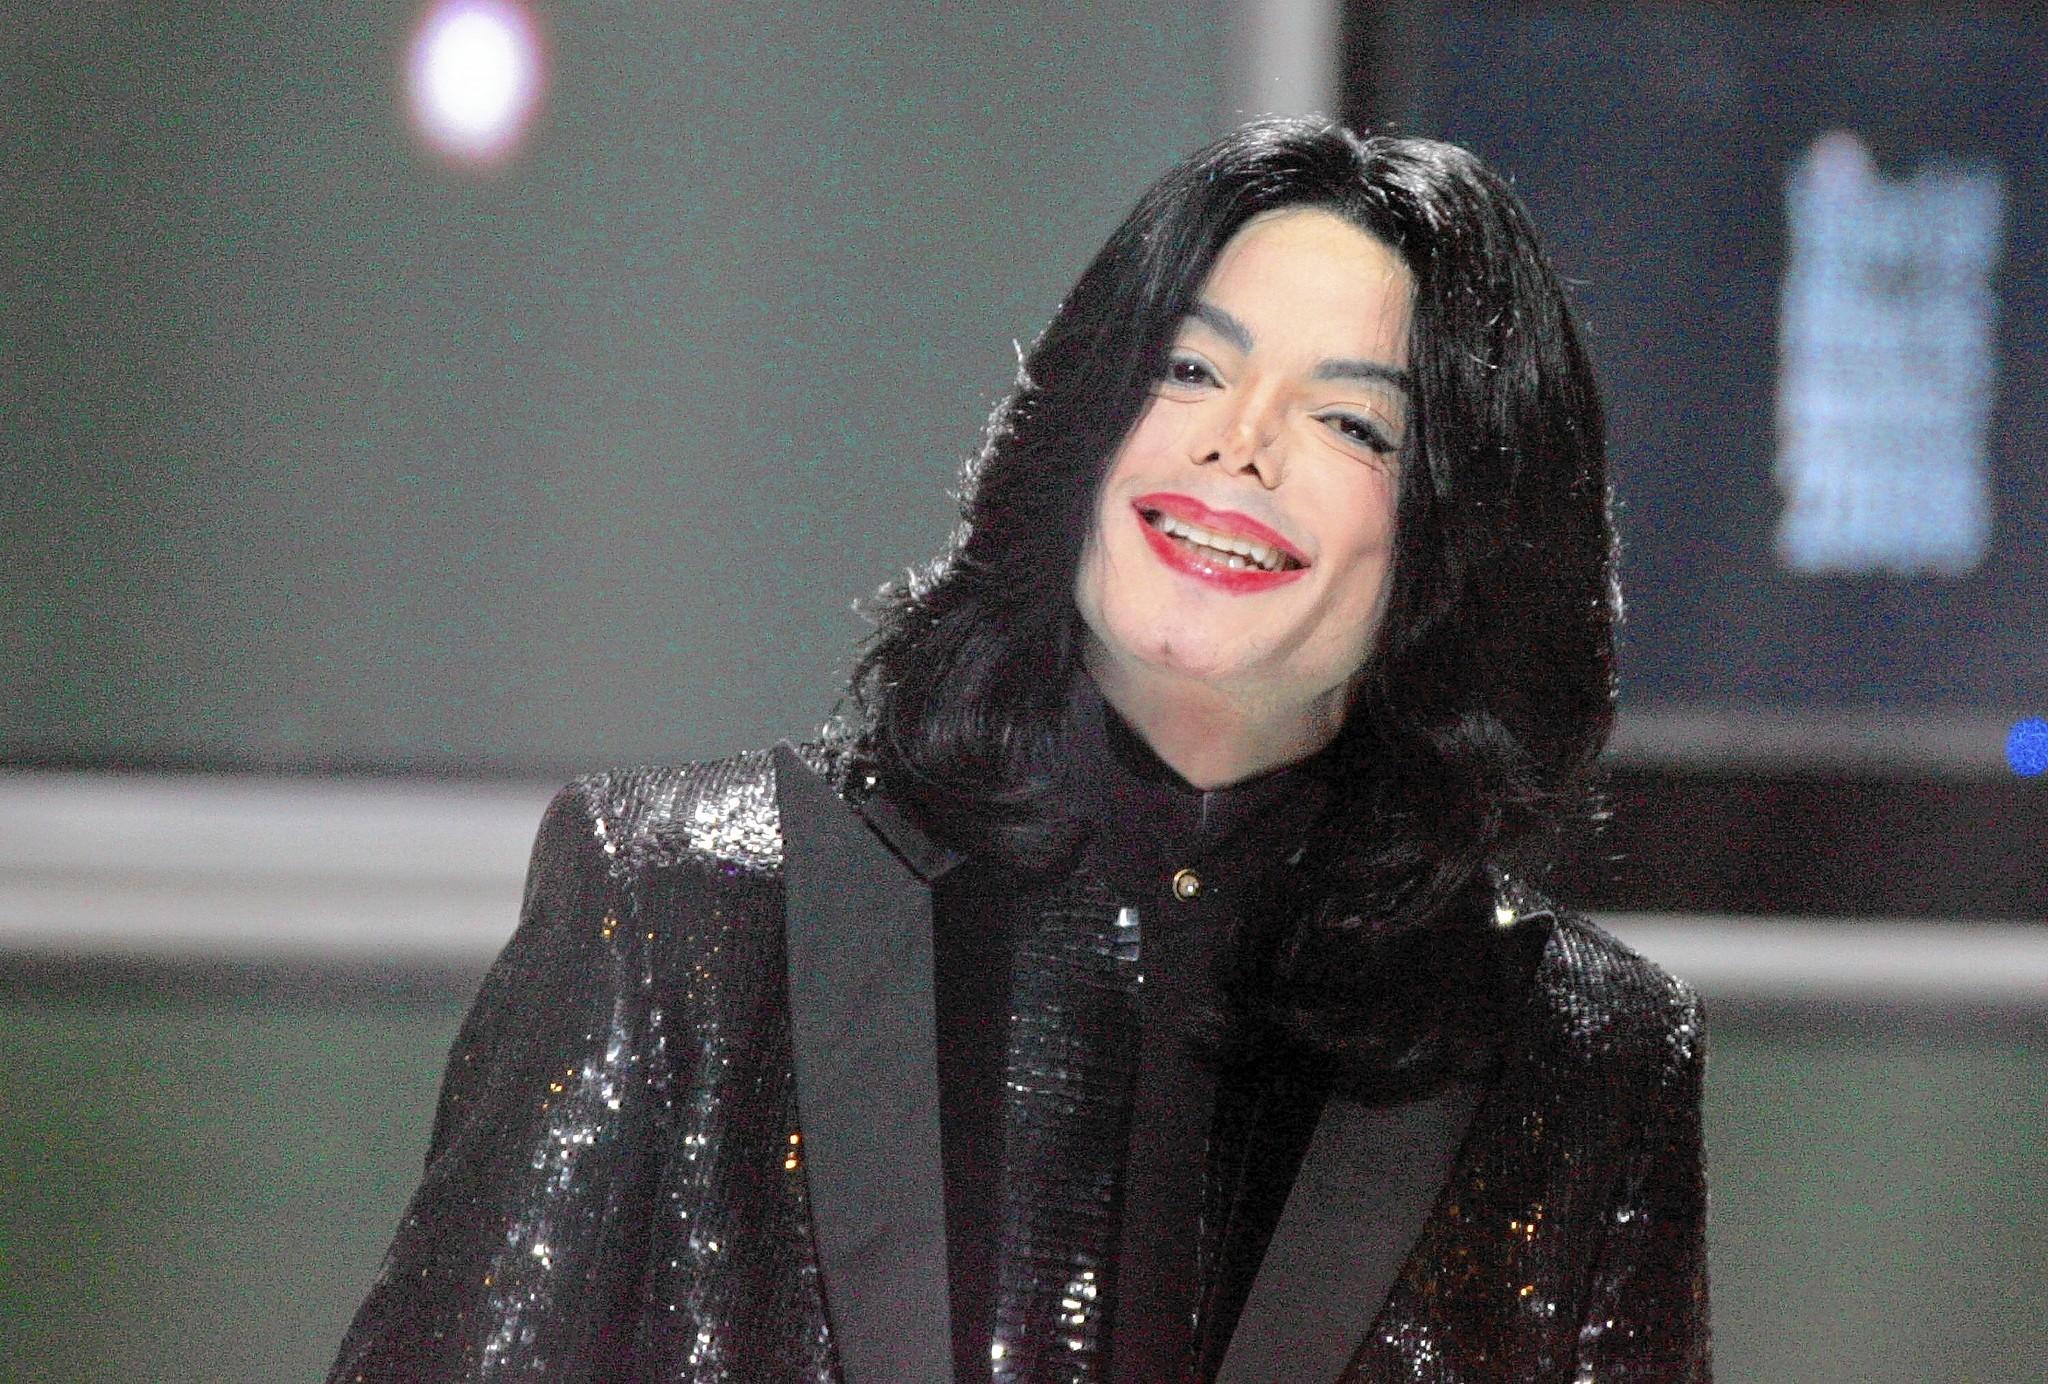 Review: 'Michael Jackson, Inc.' by Zack O'Malley Greenburg